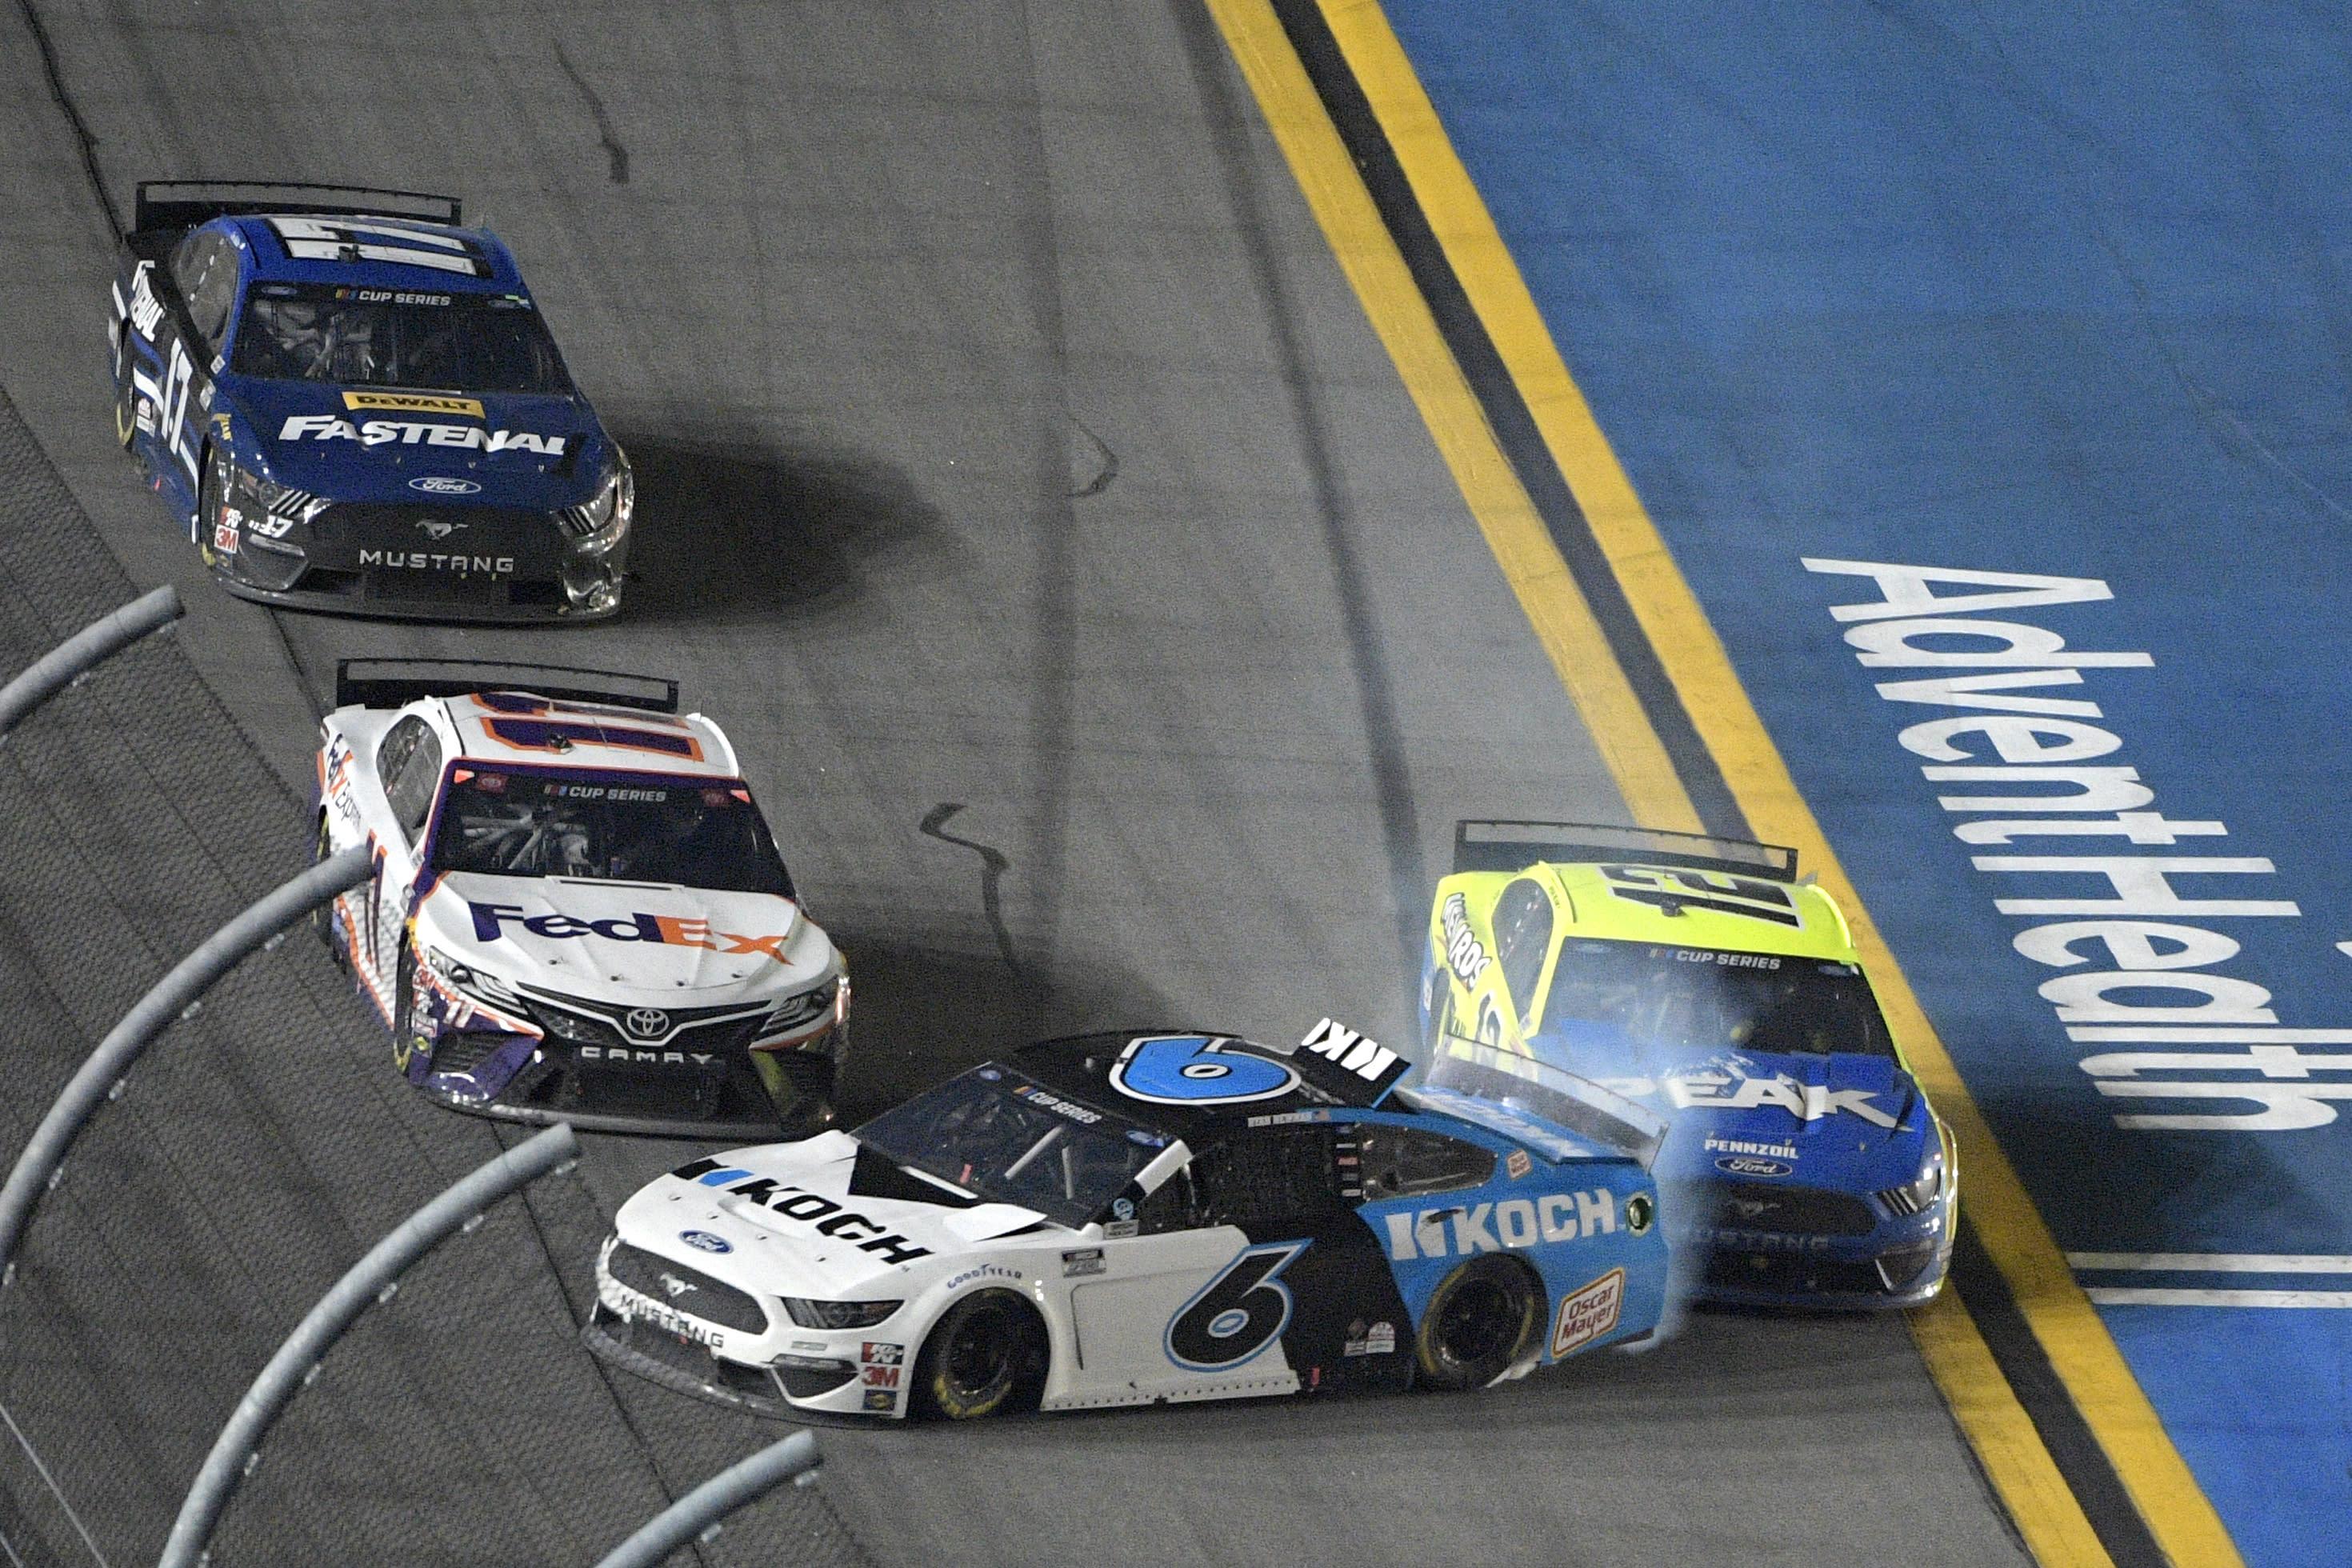 Ryan Newman (6) gets turned into the wall by Ryan Blaney (12) as Denny Hamlin (11) misses them along the front stretch to win the NASCAR Daytona 500 auto race at Daytona International Speedway, Monday, Feb. 17, 2020, in Daytona Beach, Fla. (AP Photo/Phelan M. Ebenhack)